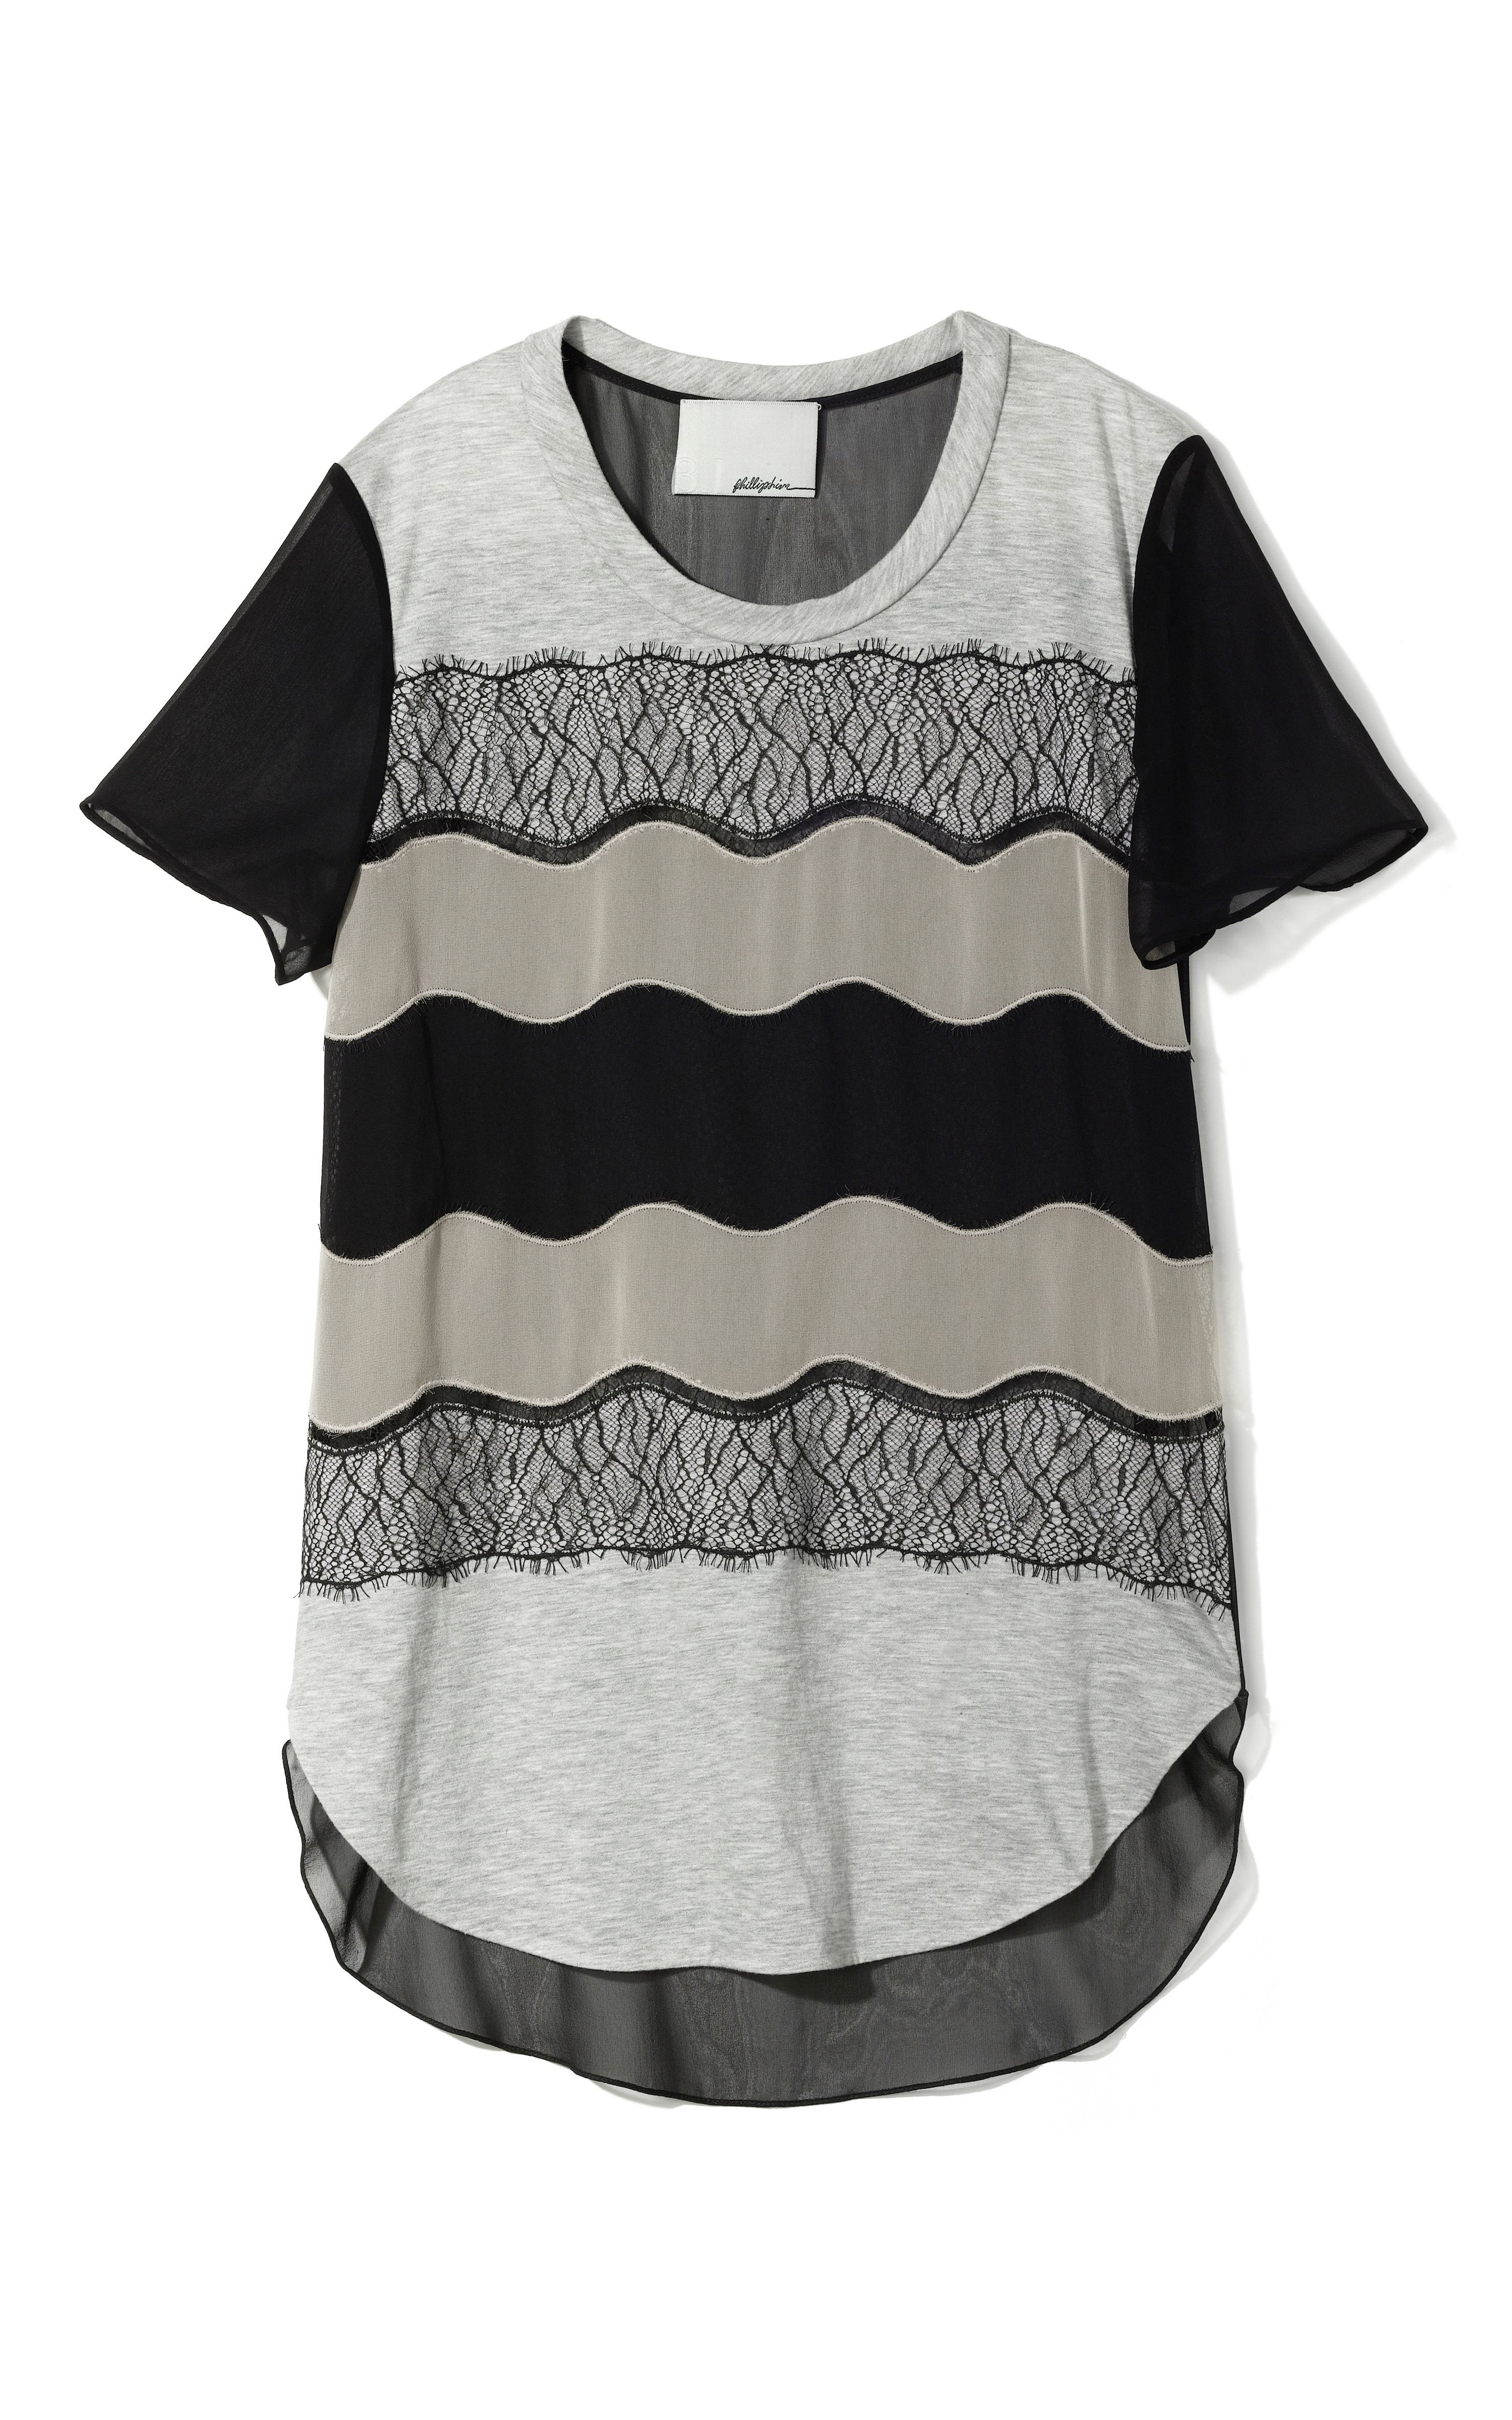 3.1 Phillip Lim Curved Hem Shirt With Lace Applique $395